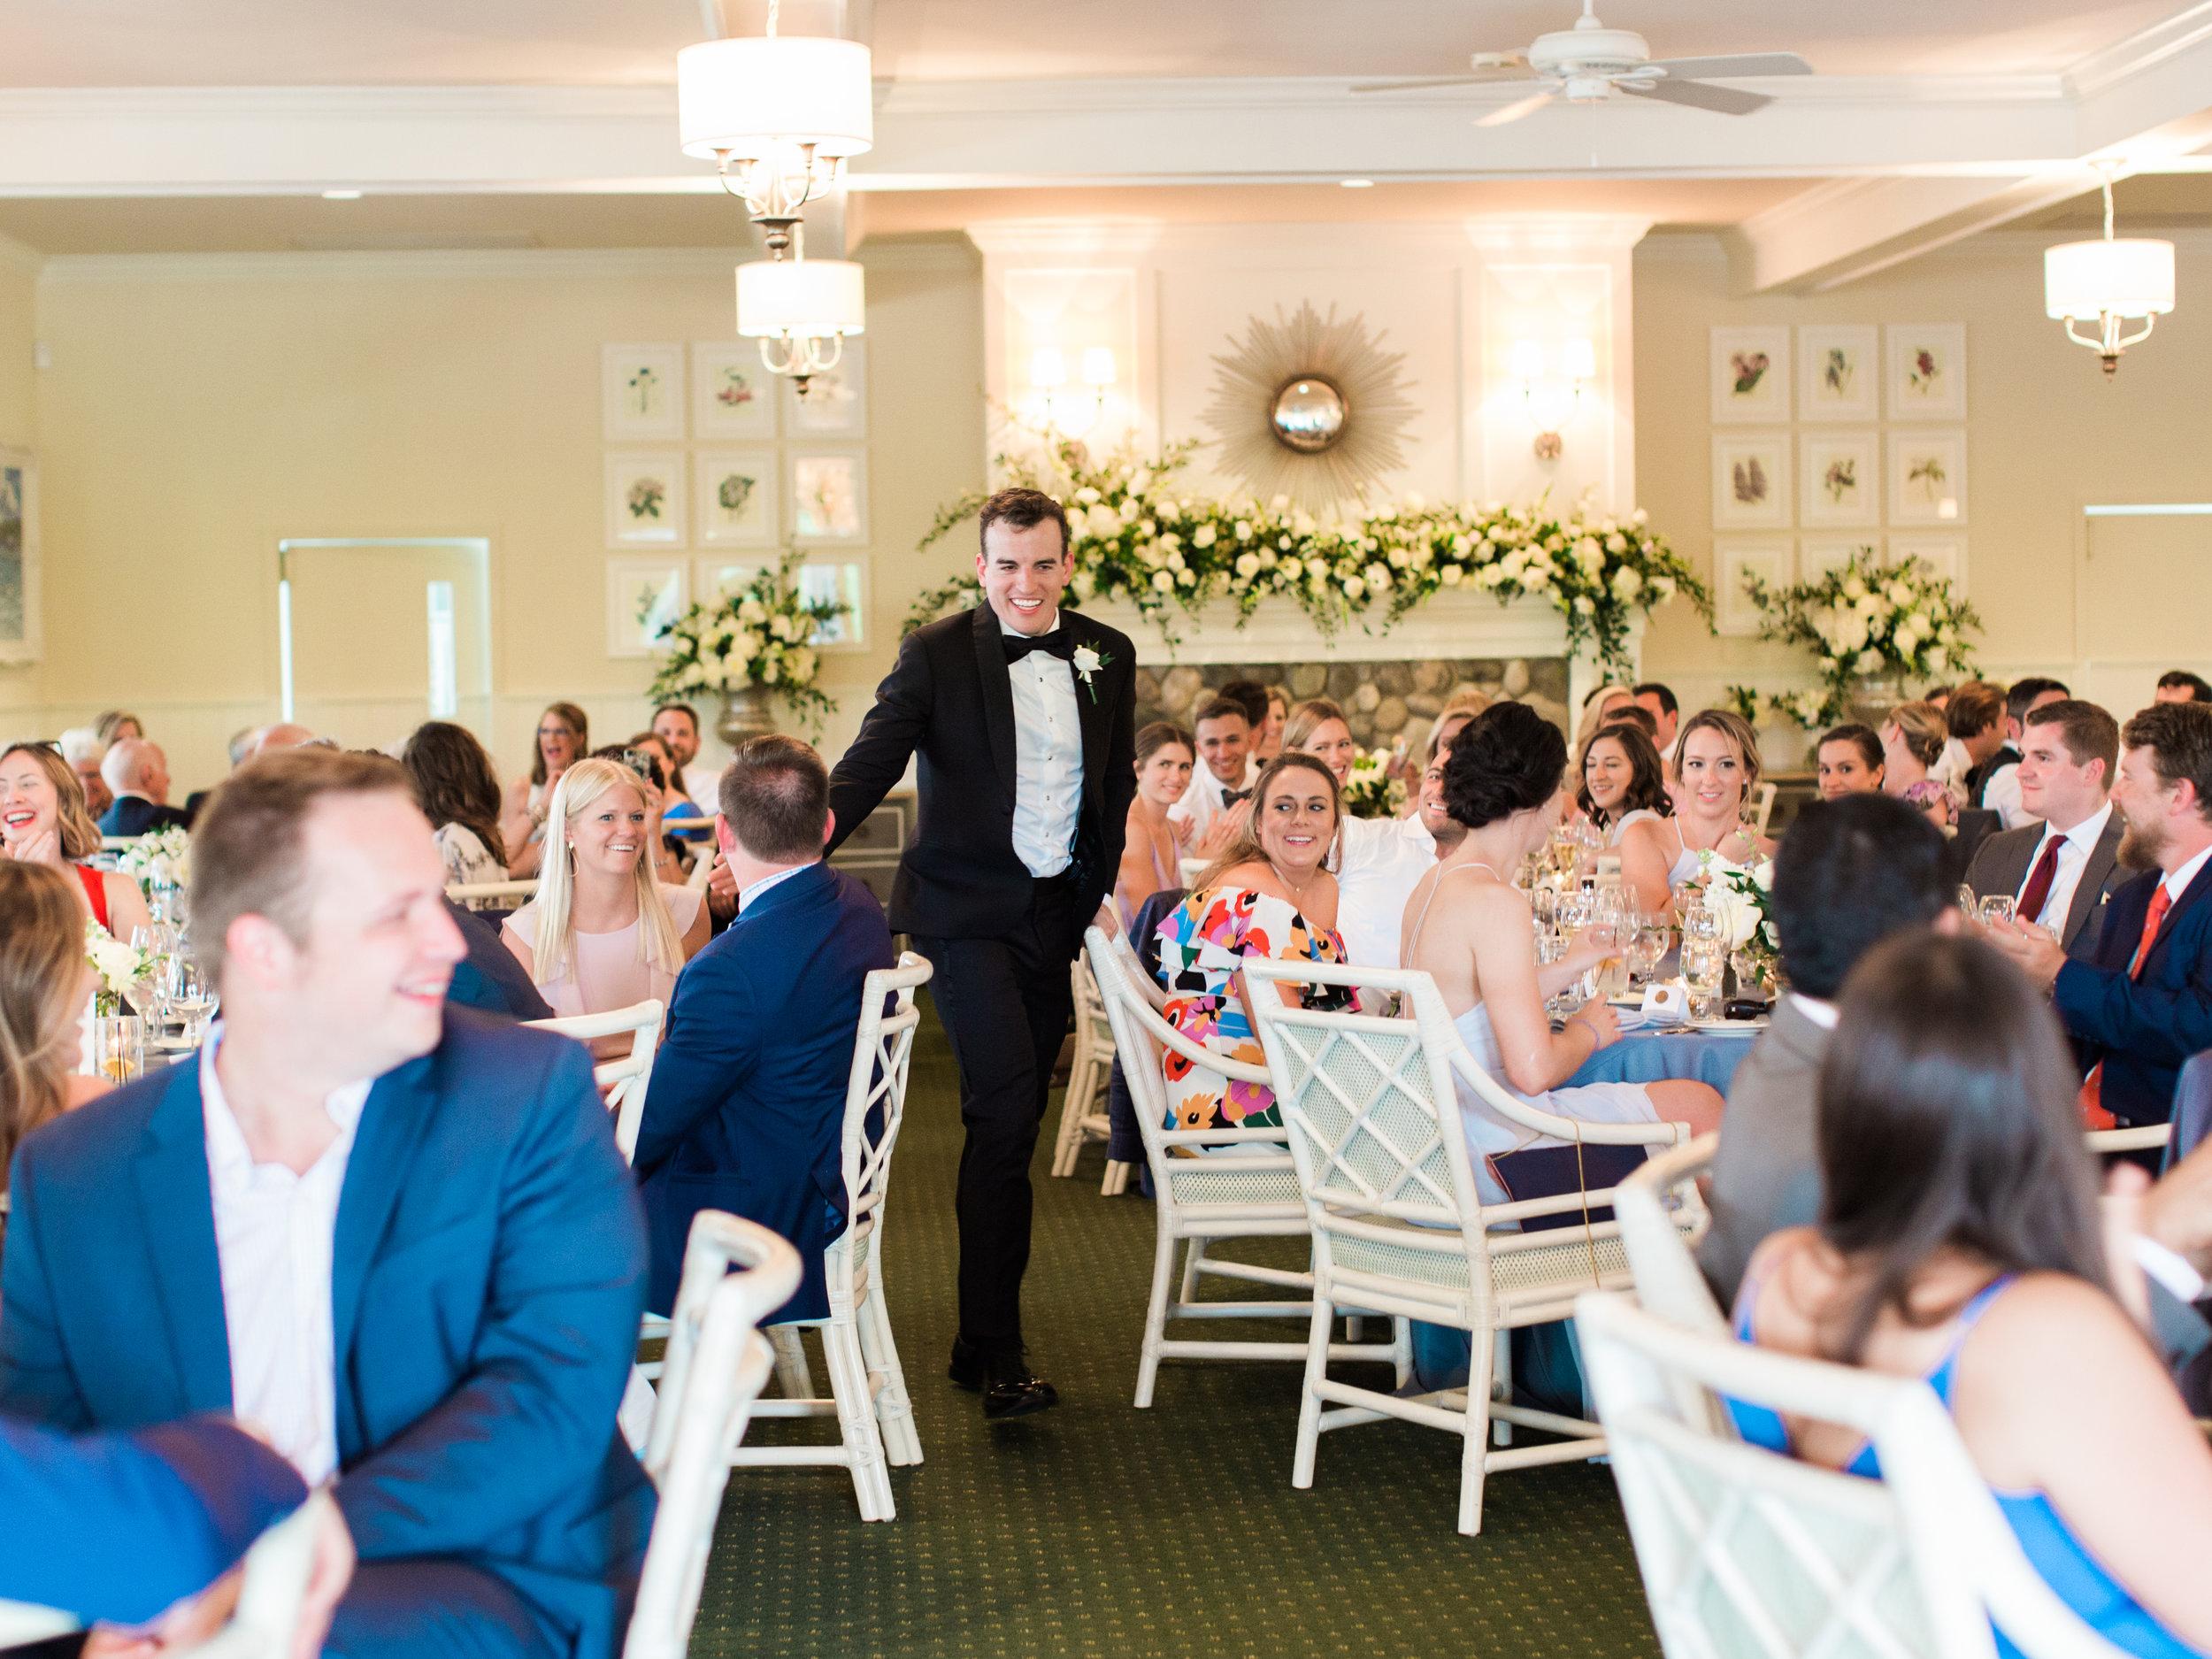 DeGuilio+Wedding+Reception-44.jpg